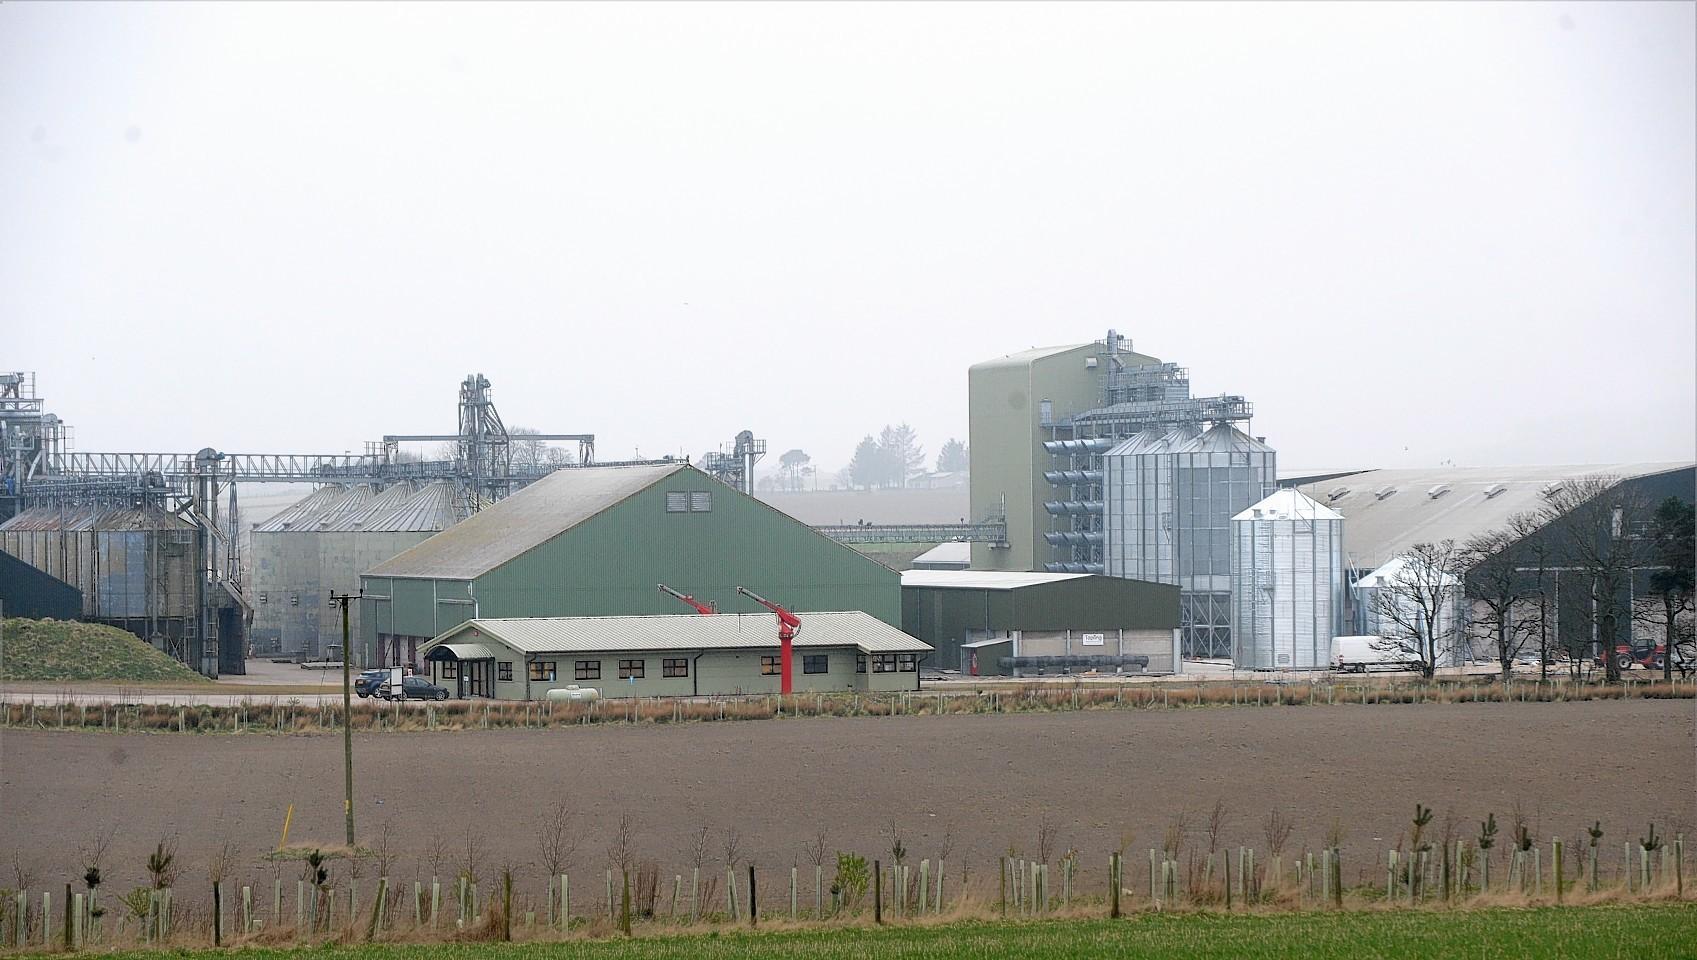 Aberdeen Grain's marketing operations are overseen